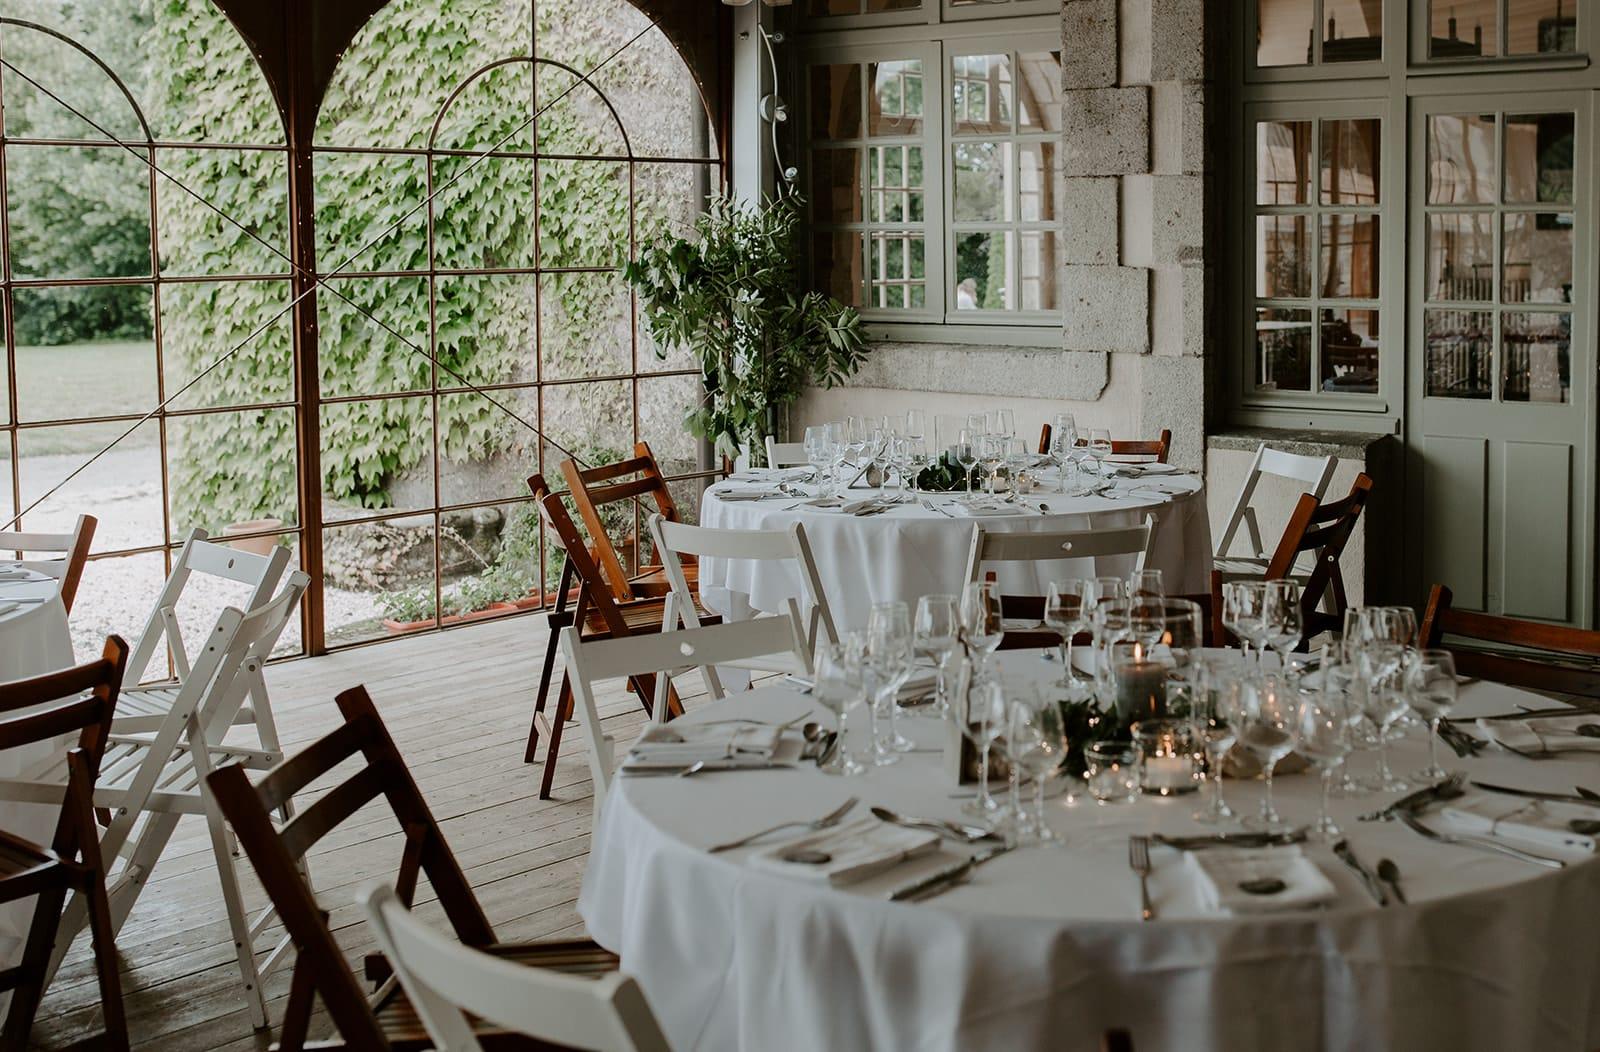 mariage_chateau_la_flocelliere_vendee_flavie_nelly_photographe-12-obonheurdesdames-decoration-mariage-location-vegetal